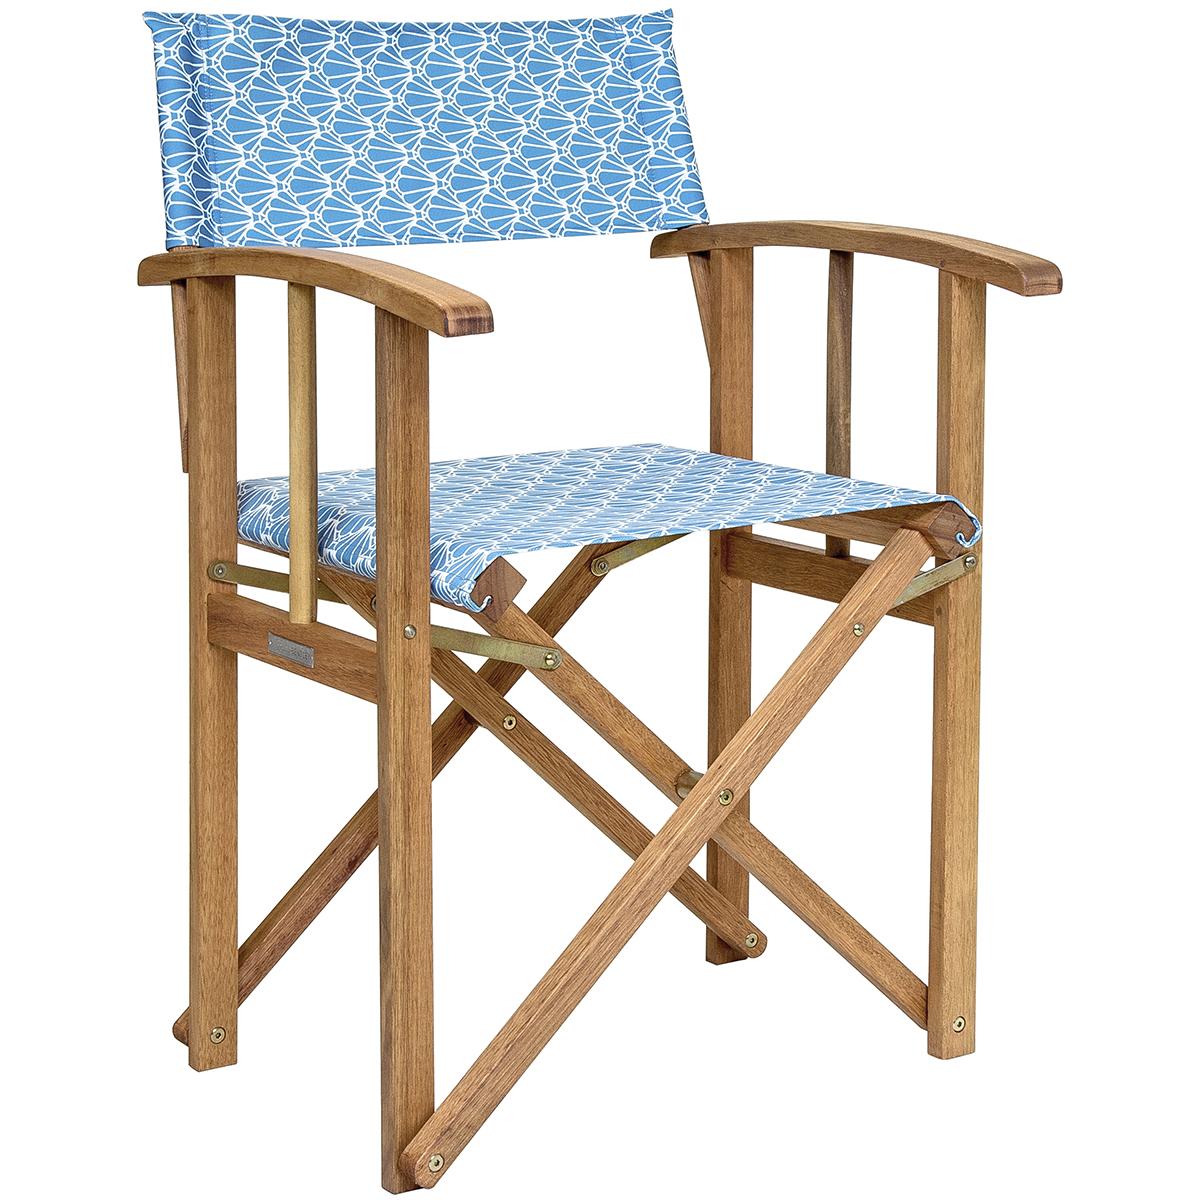 Wooden Directors Chairs charles bentley pair of folding wooden directors chairs fsc